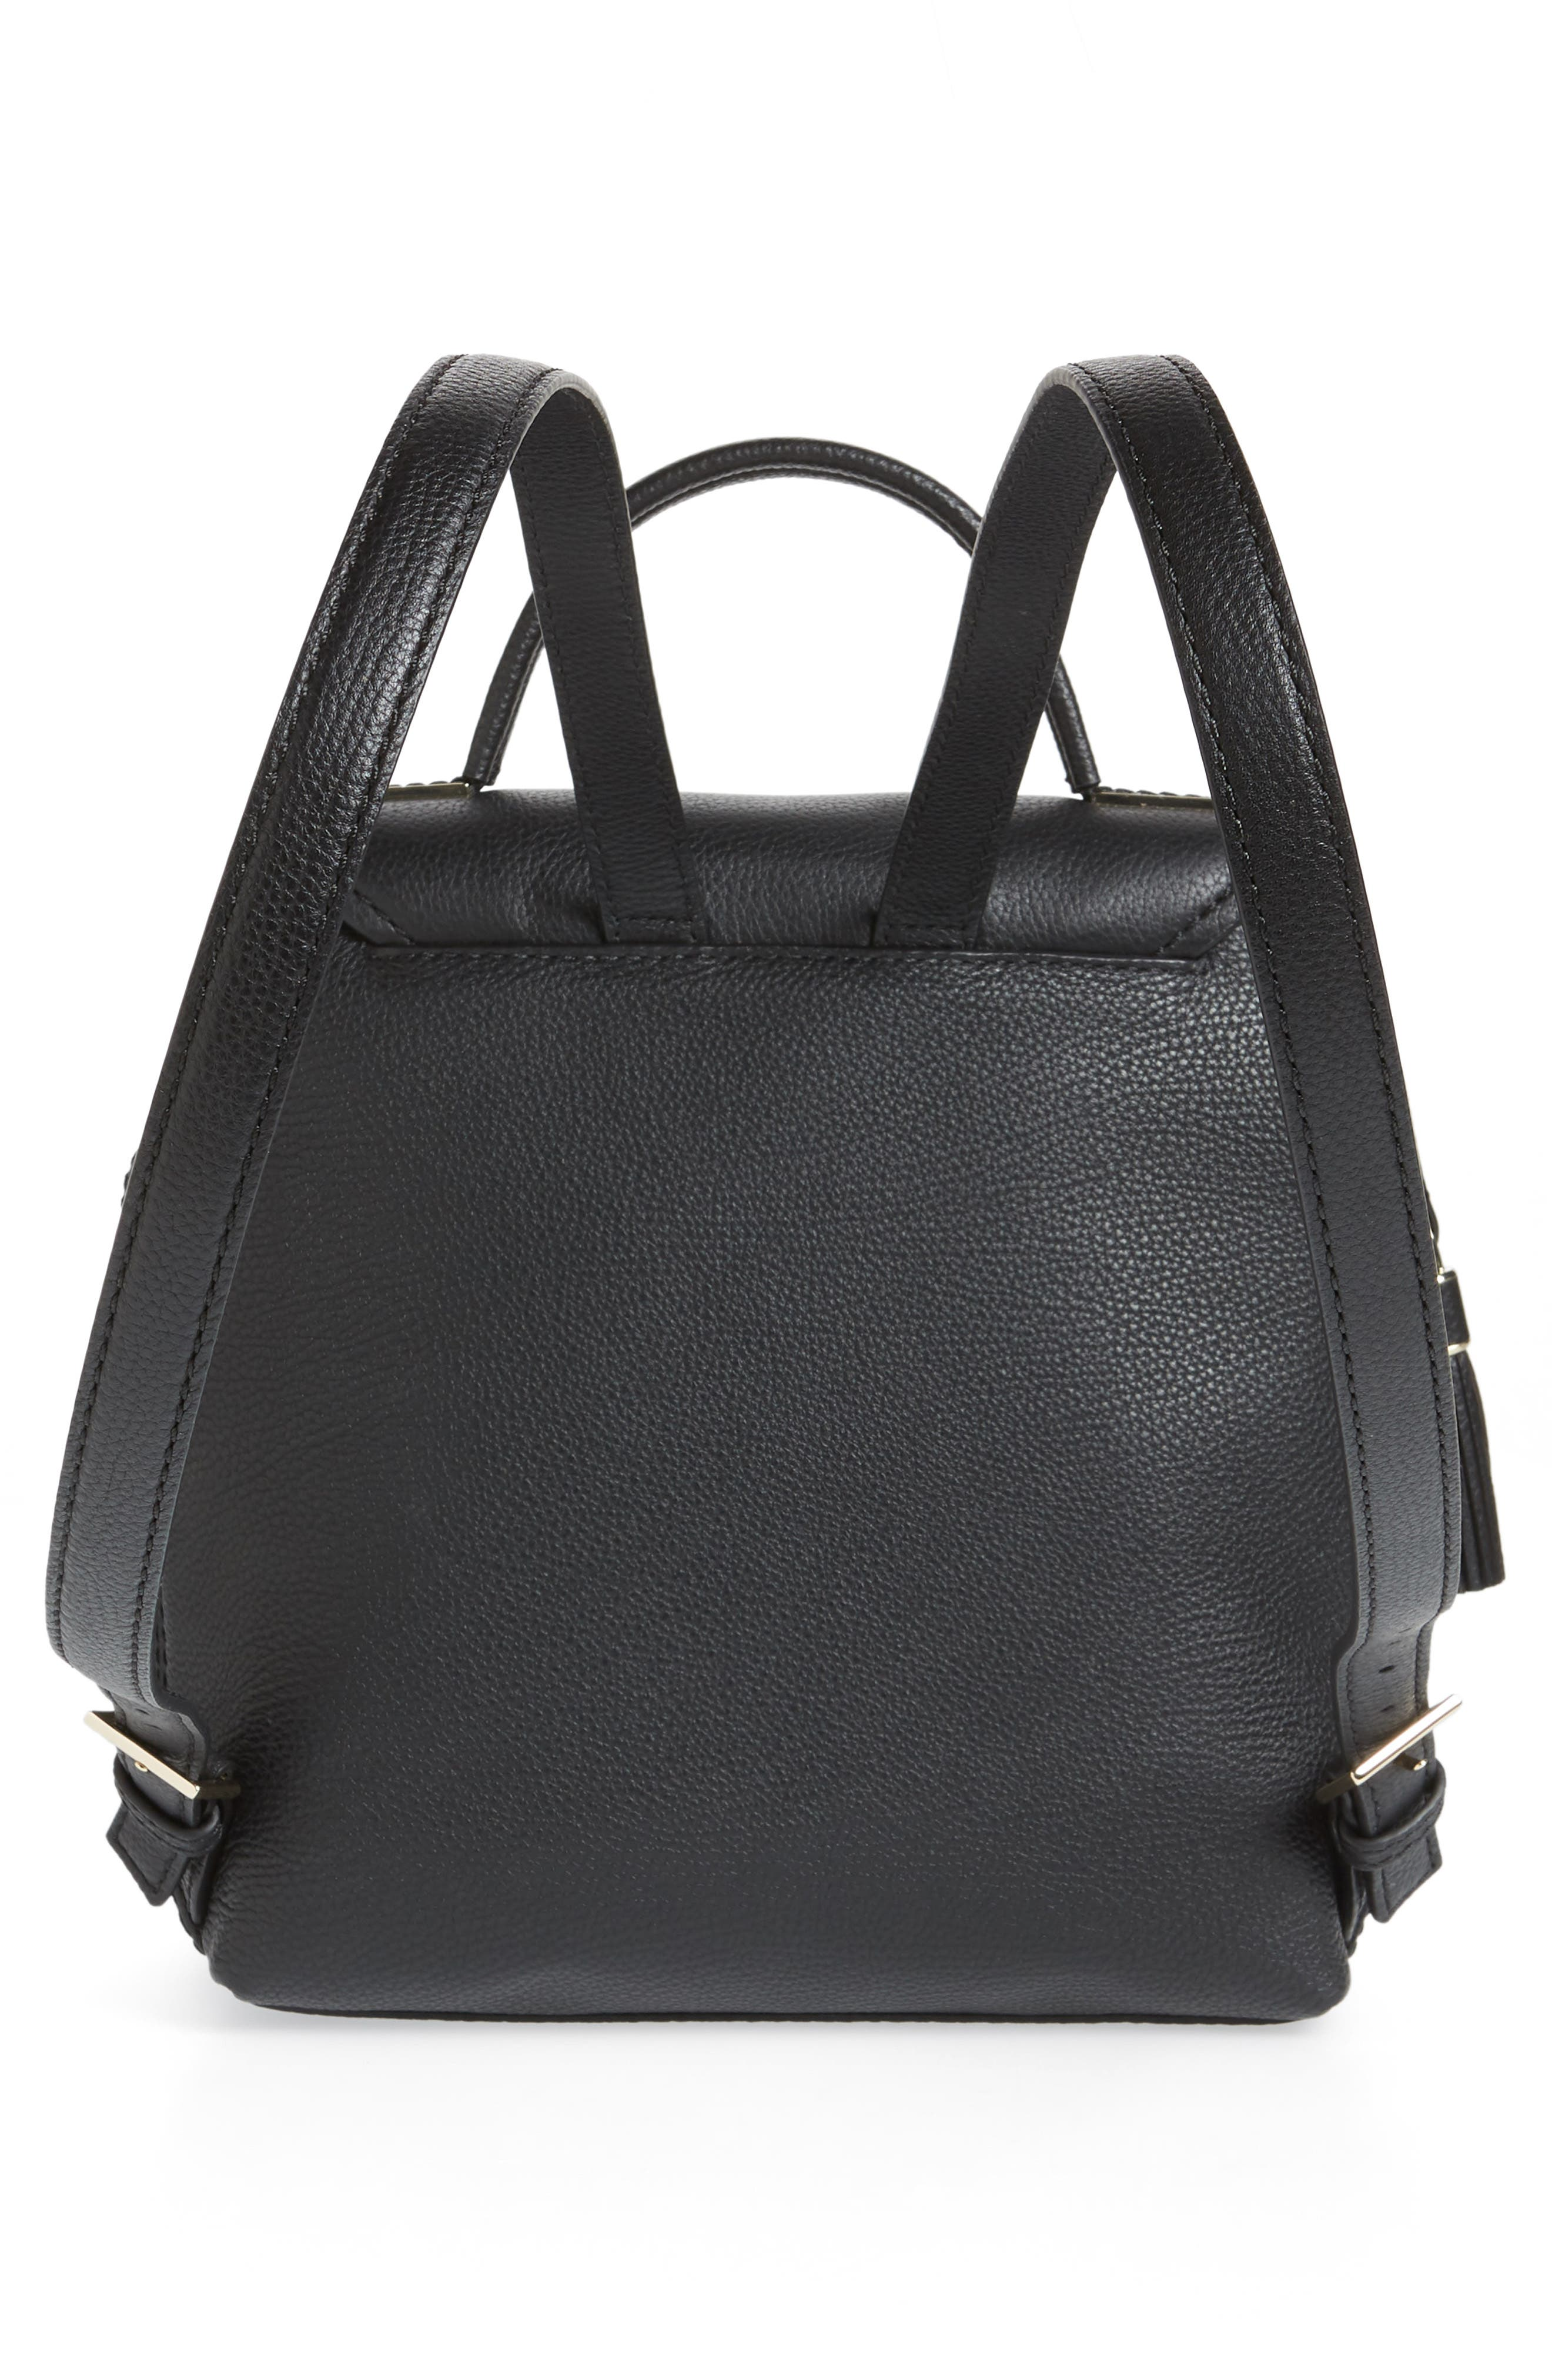 KATE SPADE NEW YORK,                             kingston drive - simona leather backpack,                             Alternate thumbnail 3, color,                             001